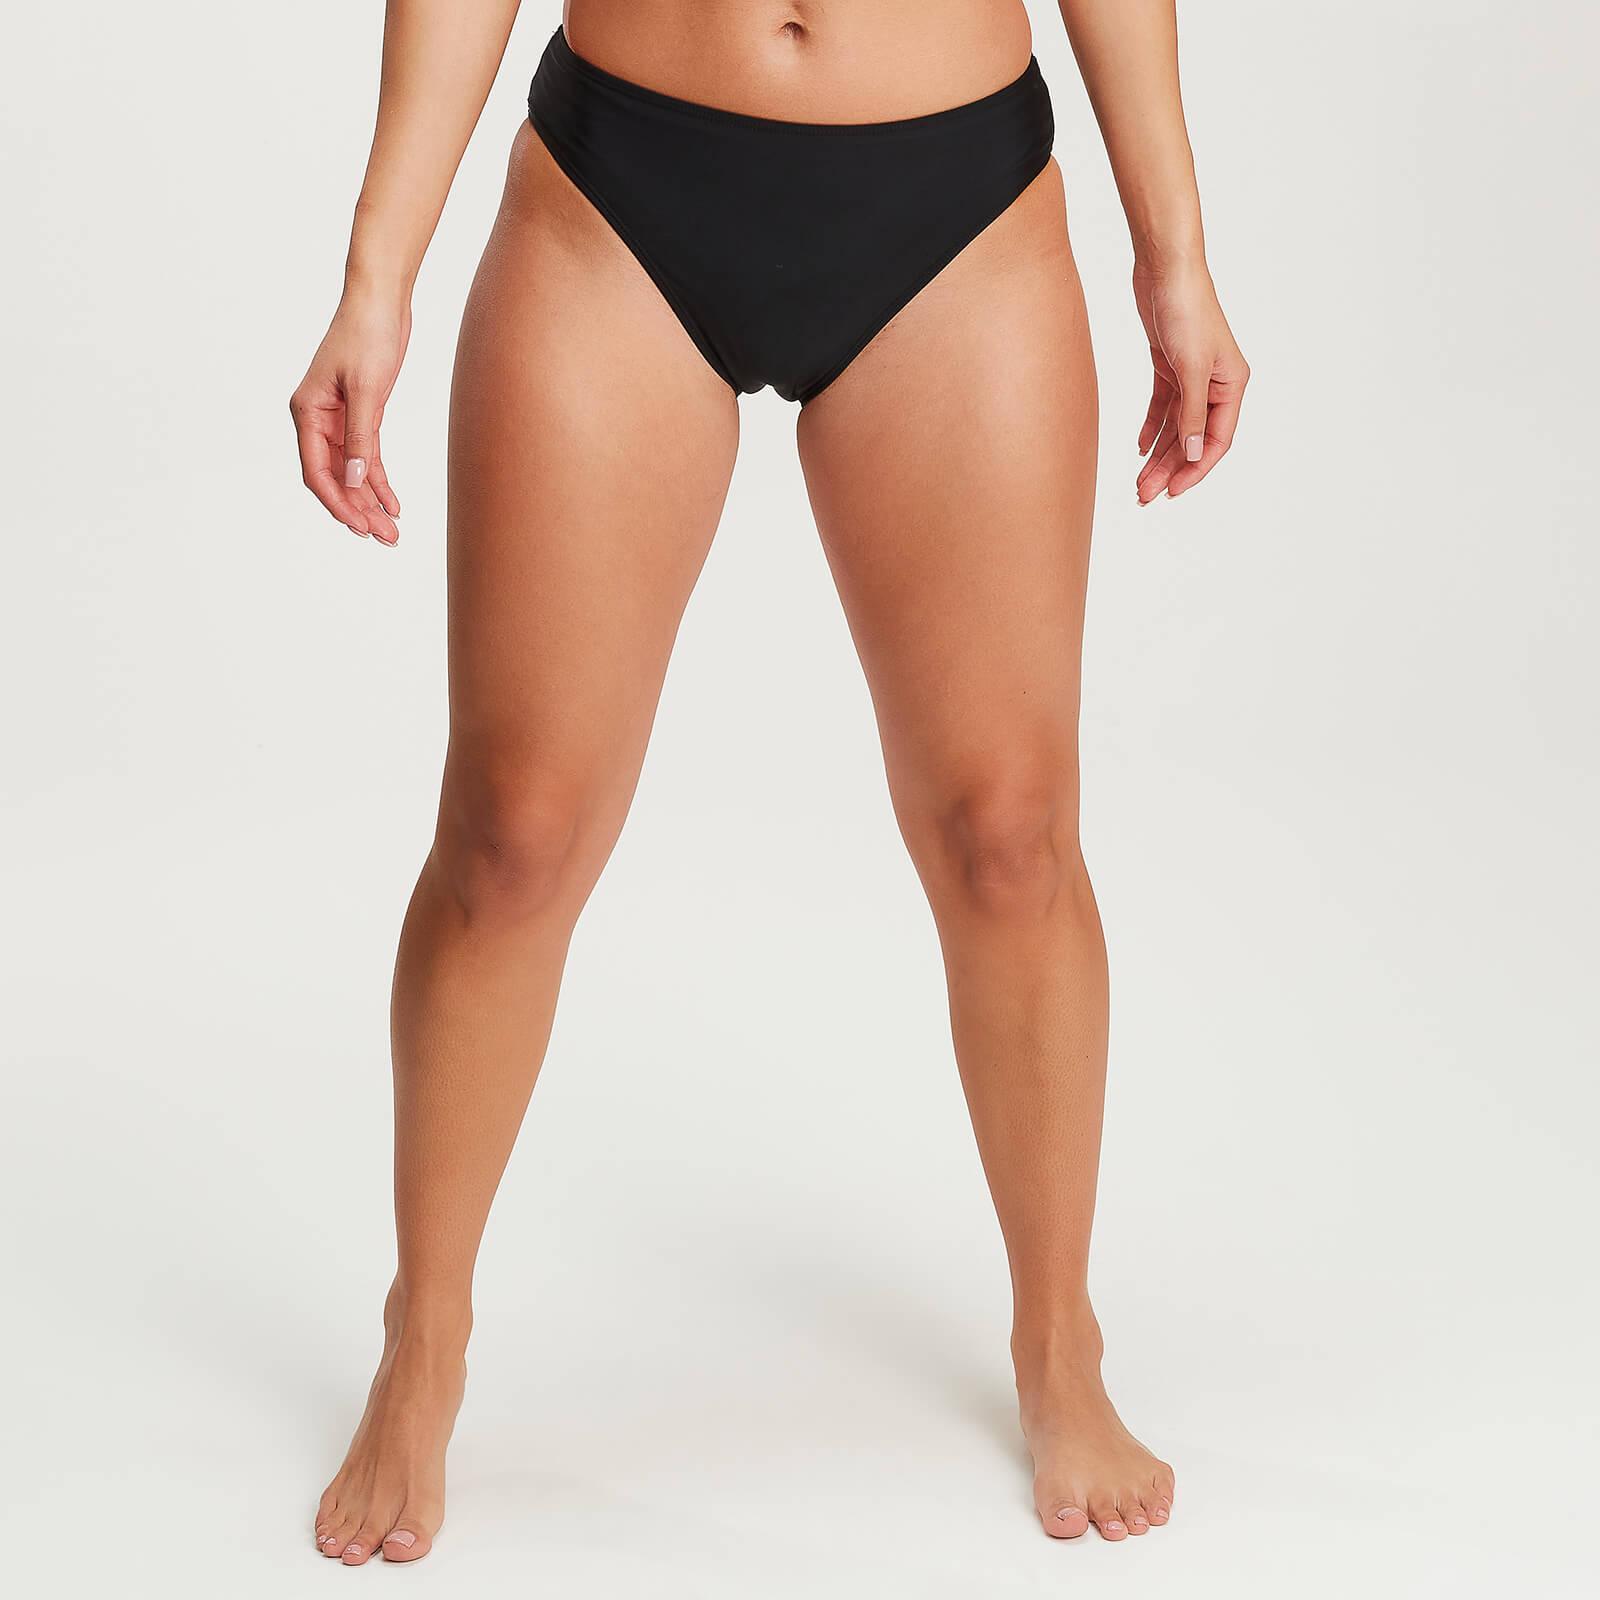 Mp Braguita de bikini Essentials para mujer de  - Negro - S